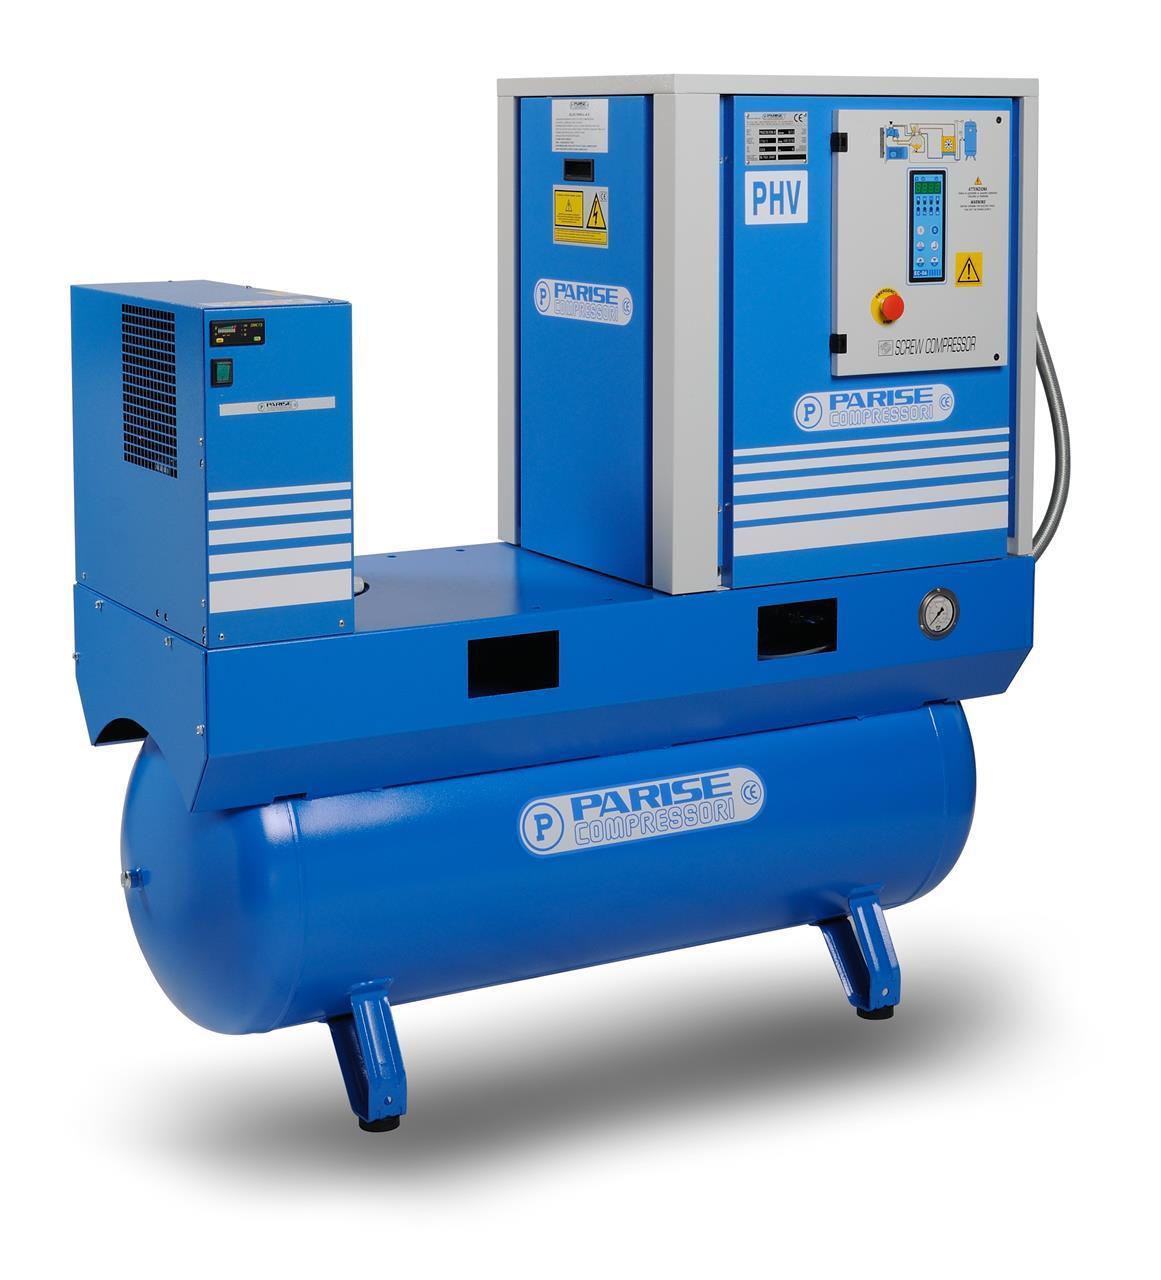 PARISE Ruuvikompressori 7.5kW, 950L/min, 8bar PHV10S270E/EC06-08 säiliöllä ja kuivaimella